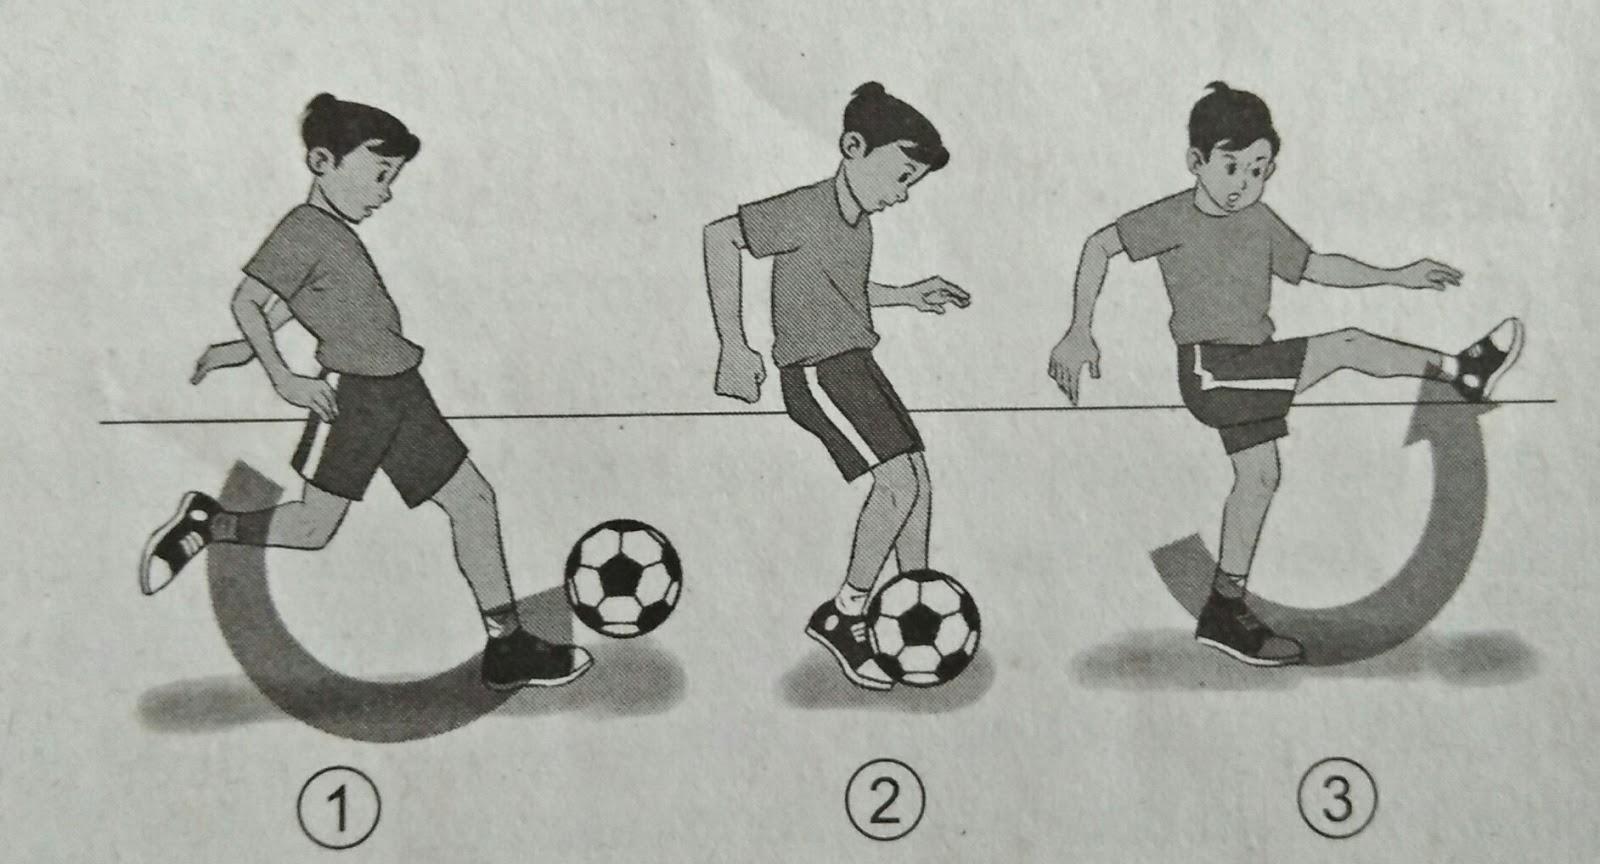 Kombinasi Gerak Dasar Lokomotor Nonlokomotor Dan Manipulatif Dalam Permainan Bola Besar Penjaskes